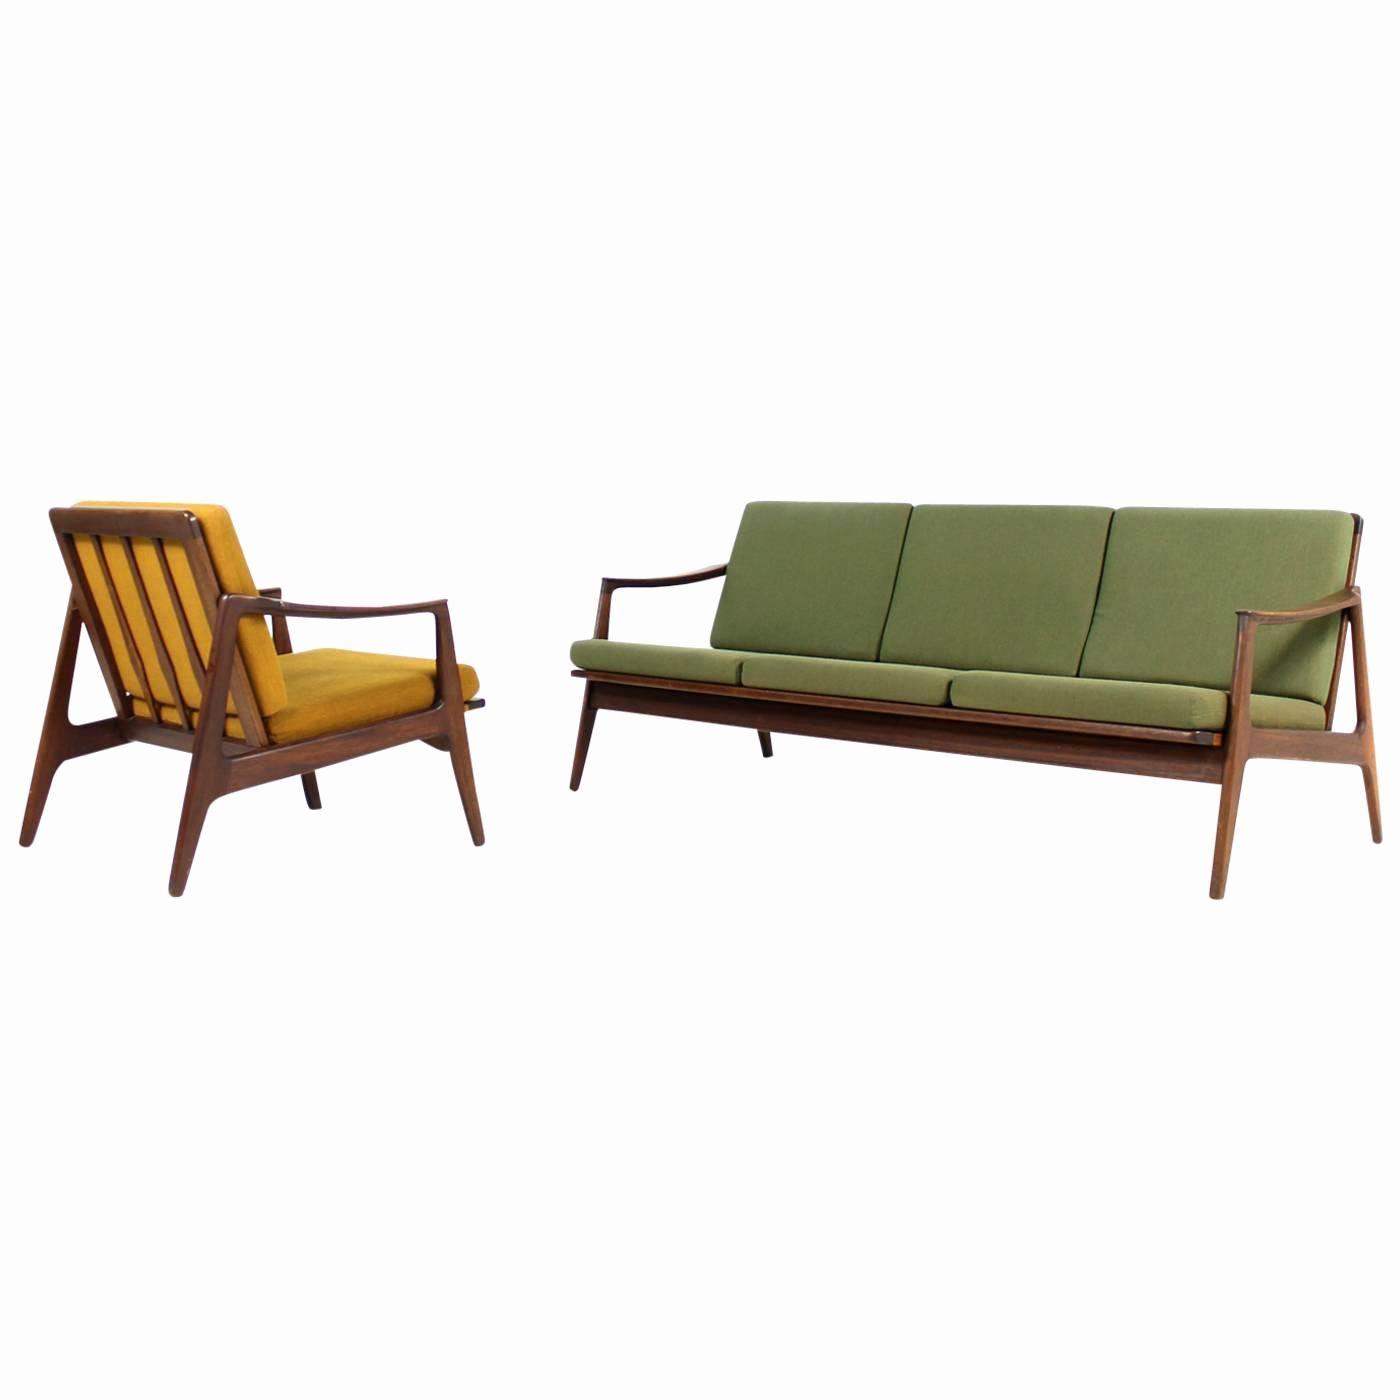 Living Room Design Ideas 50 Inspirational Sofas:  Inspirational Danish Modern Sleeper Sofa Images Danish